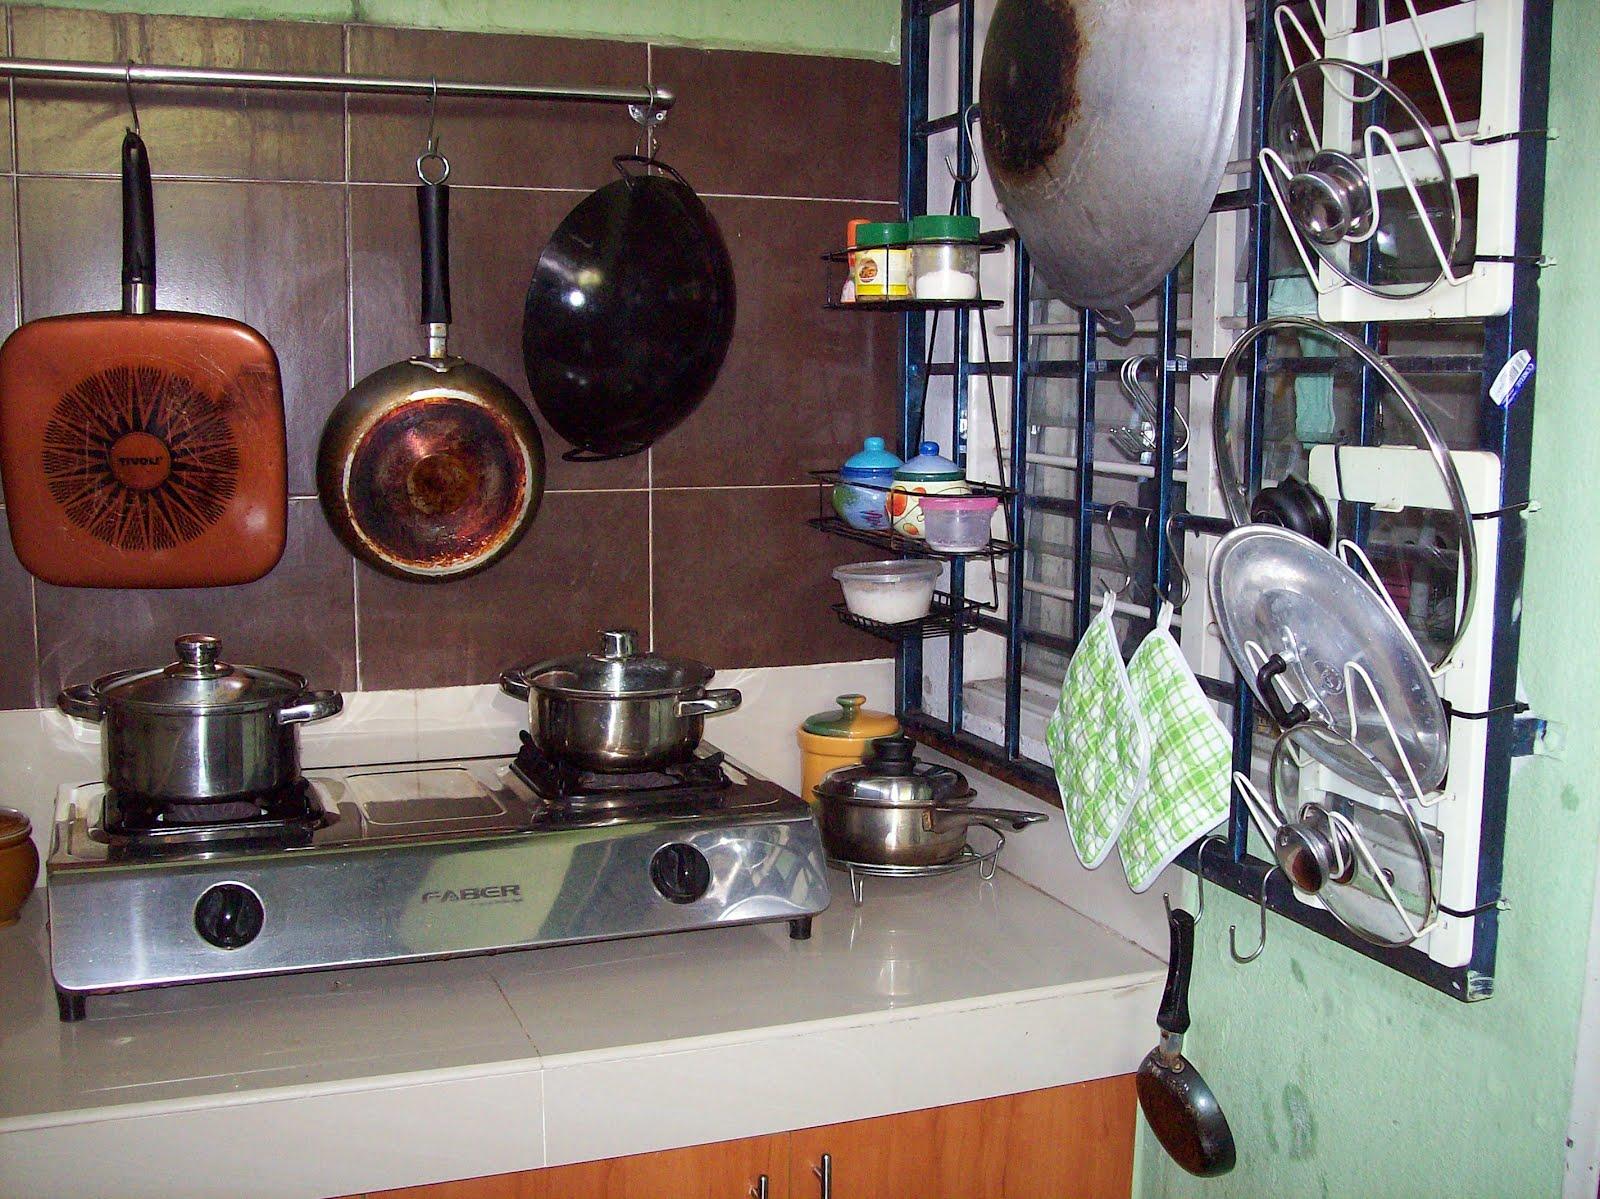 Rencah Kehinku Dapur Basah Pakaian Seragam Pakai Yang Bersih Setiap Hari Dan Hanya Memakainya Di Tempat Kerja